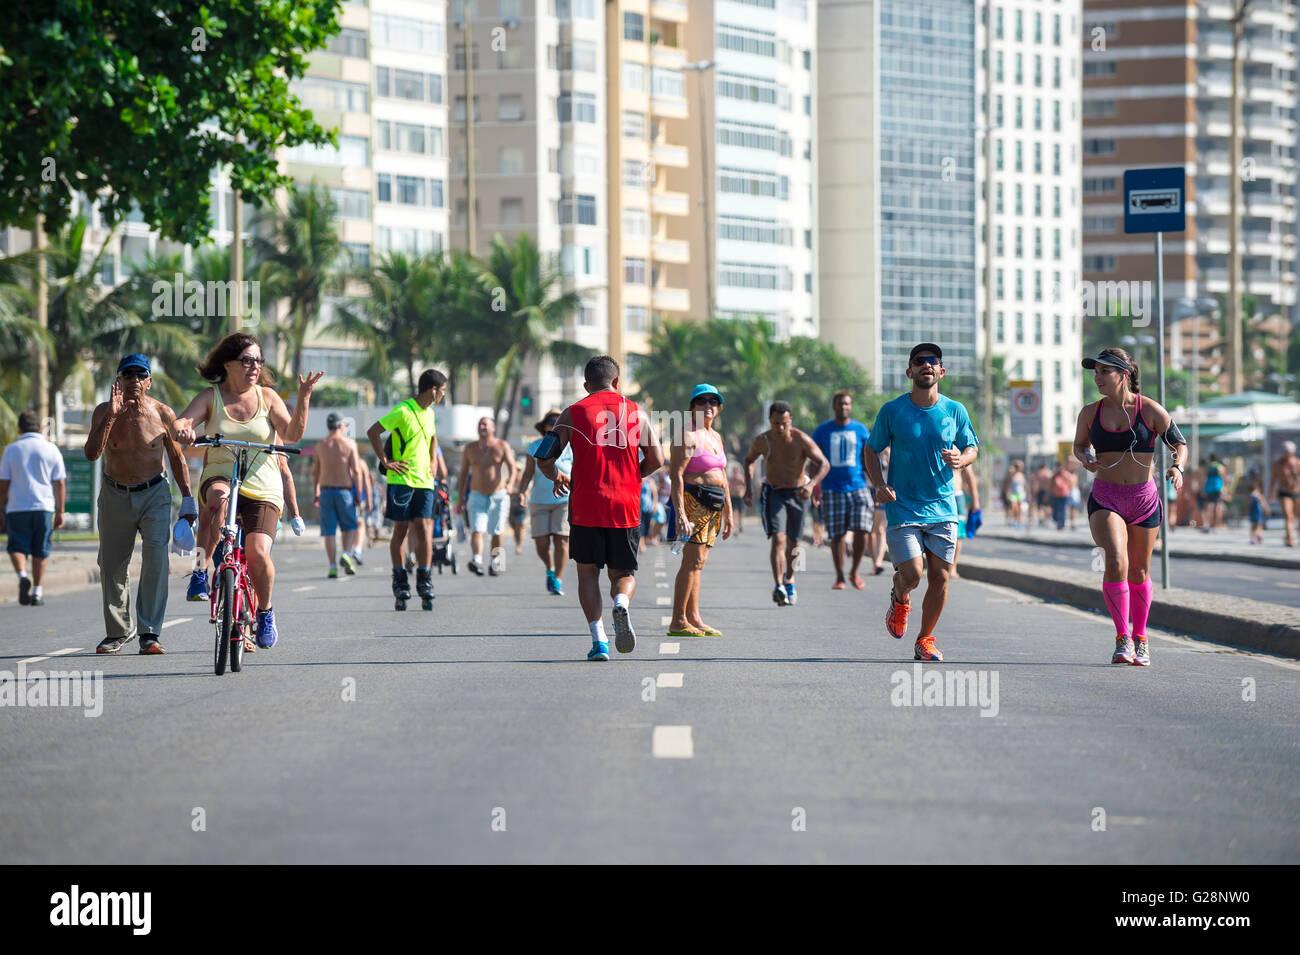 RIO DE JANEIRO - APRIL 3, 2016: Joggers and walkers share the beachfront Avenida Atlântica on a car-free morning - Stock Image